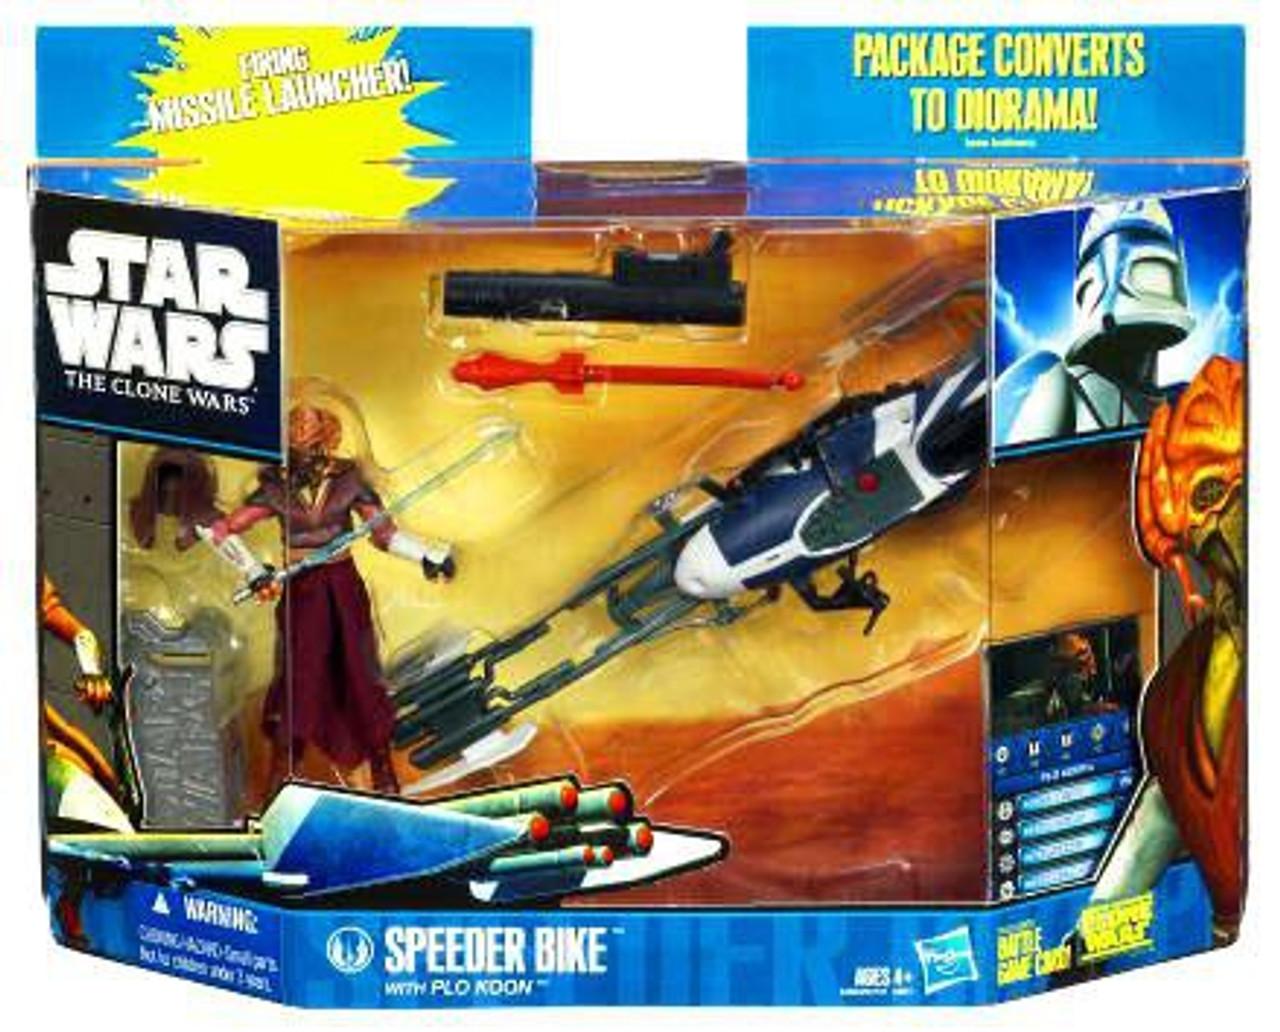 Star Wars The Clone Wars Vehicles & Action Figure Sets 2010 Speeder Bike with Plo Koon Action Figure Set